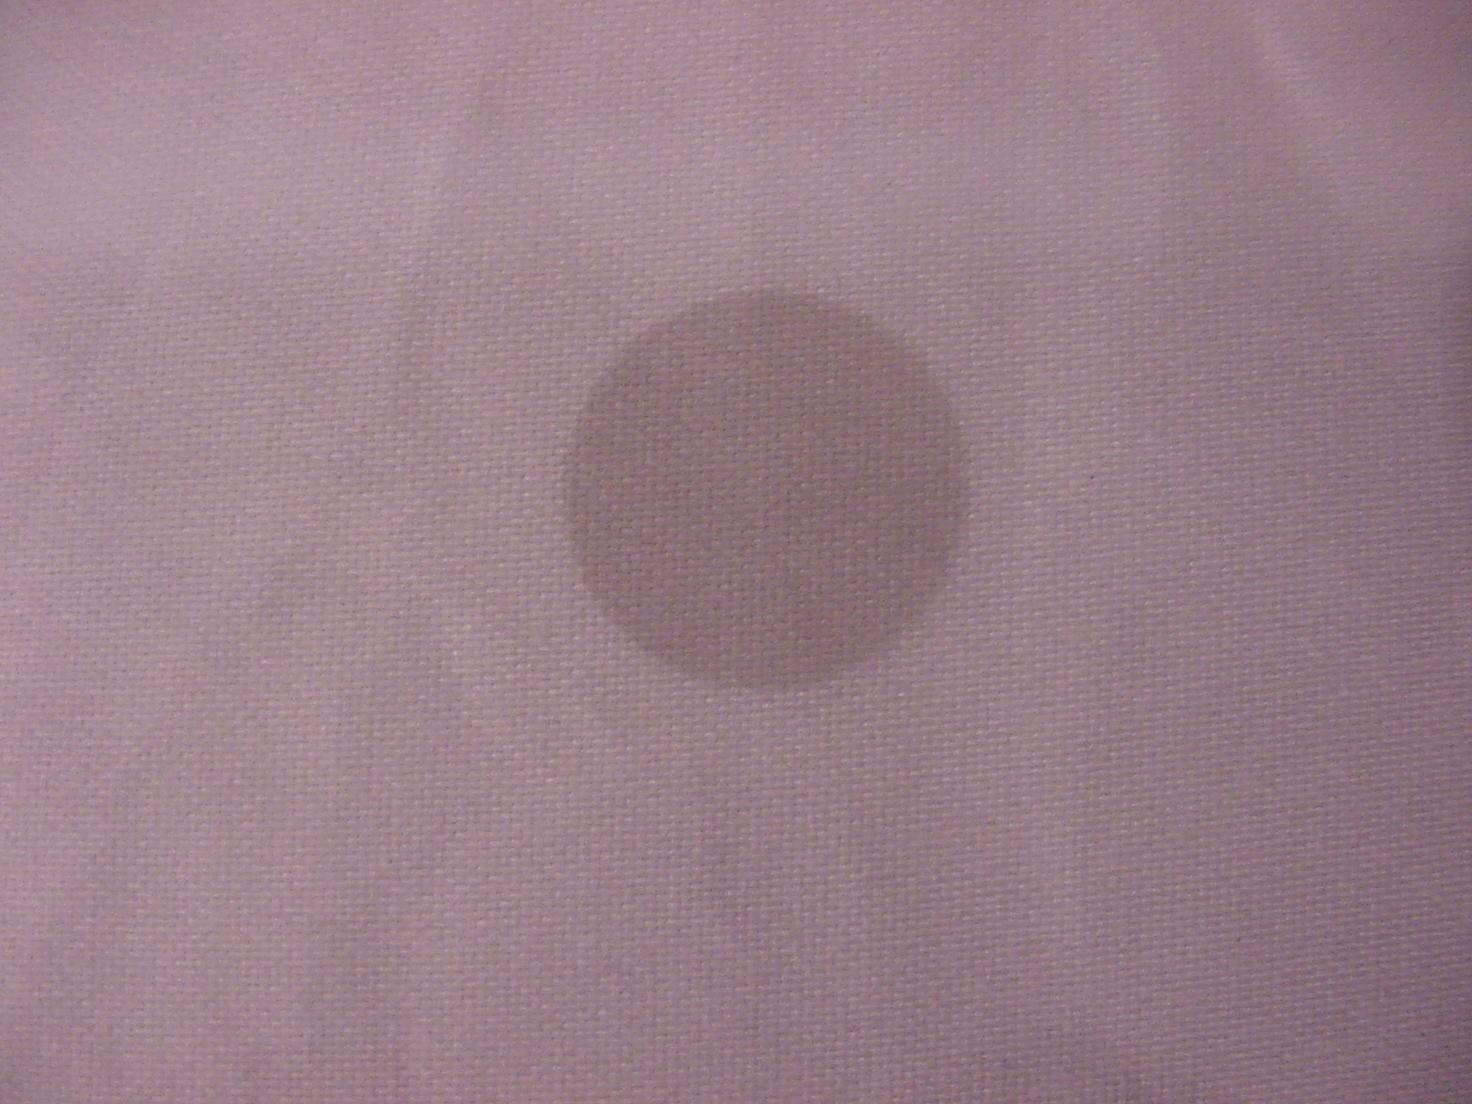 Kate Spade Gray Mini Deco Dot on White Sheet Set Queen